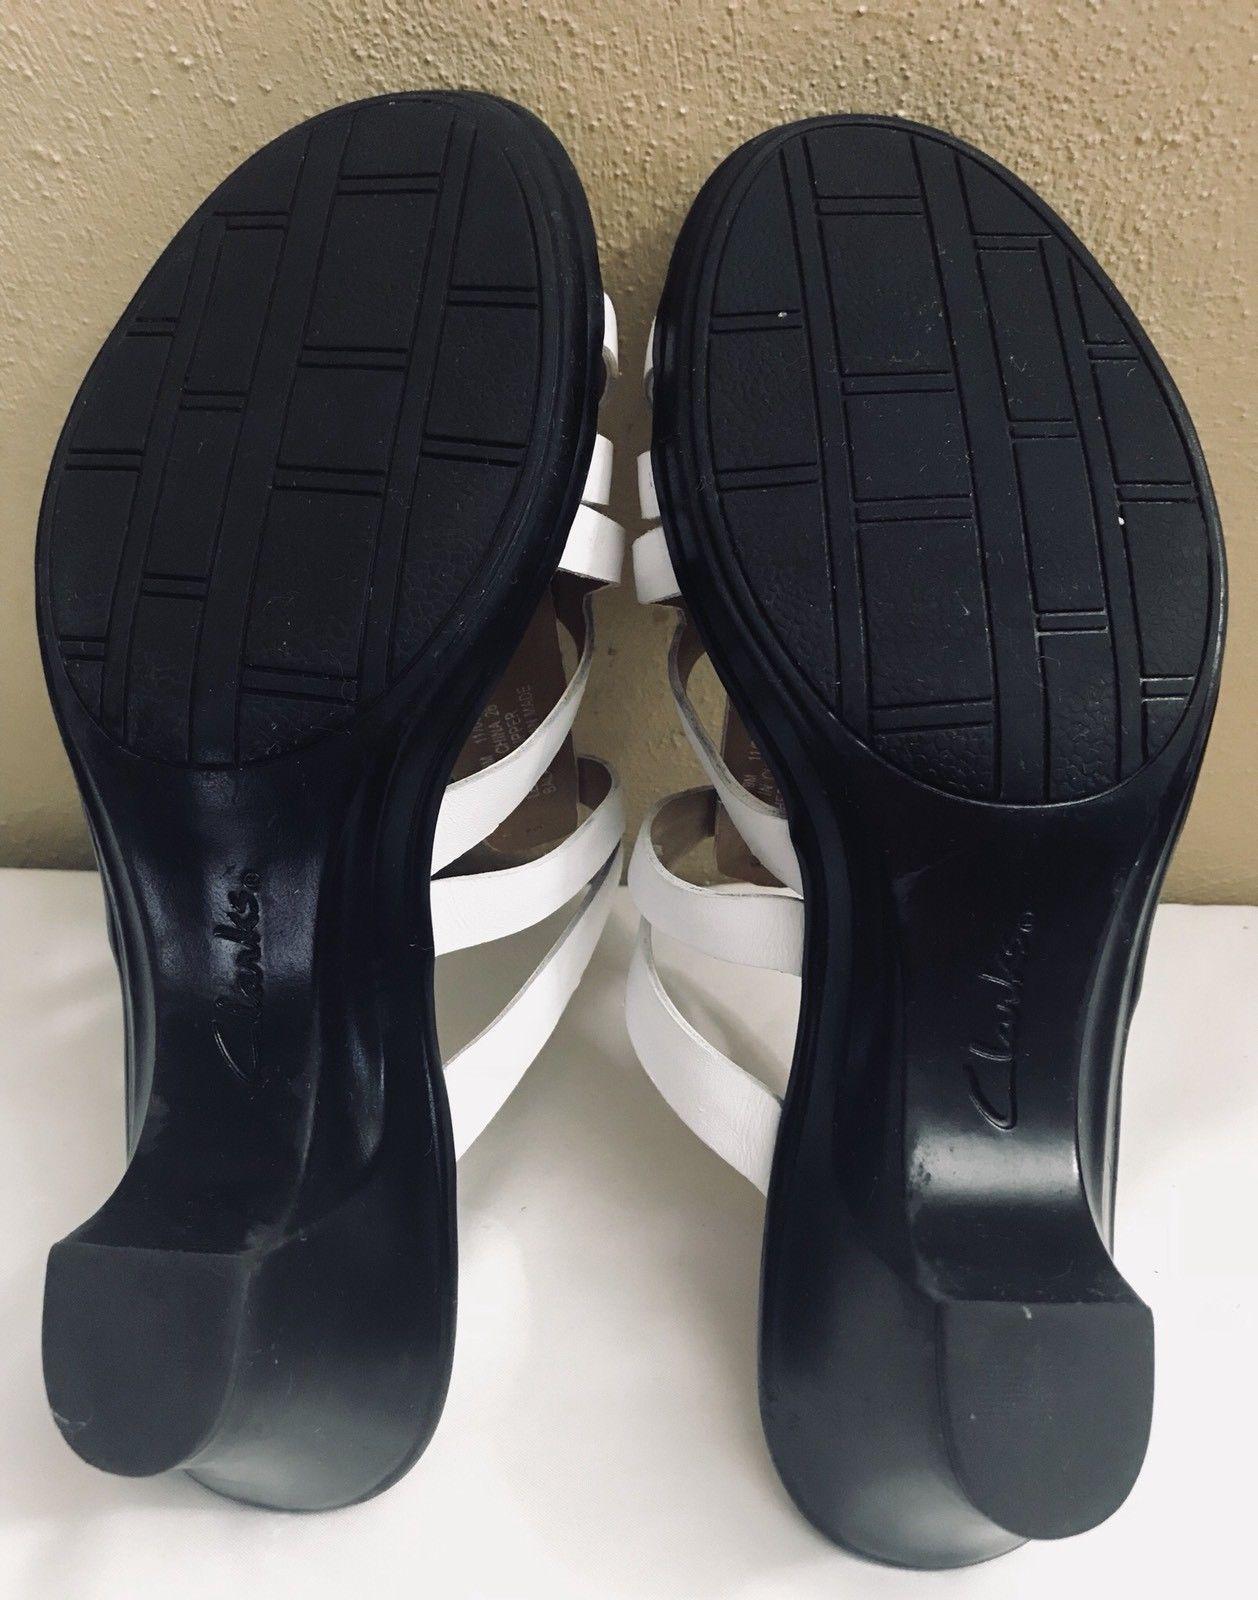 Details about Clarks Artisan Leather Block Heel Sandals Briatta Key Light Tan wide 10